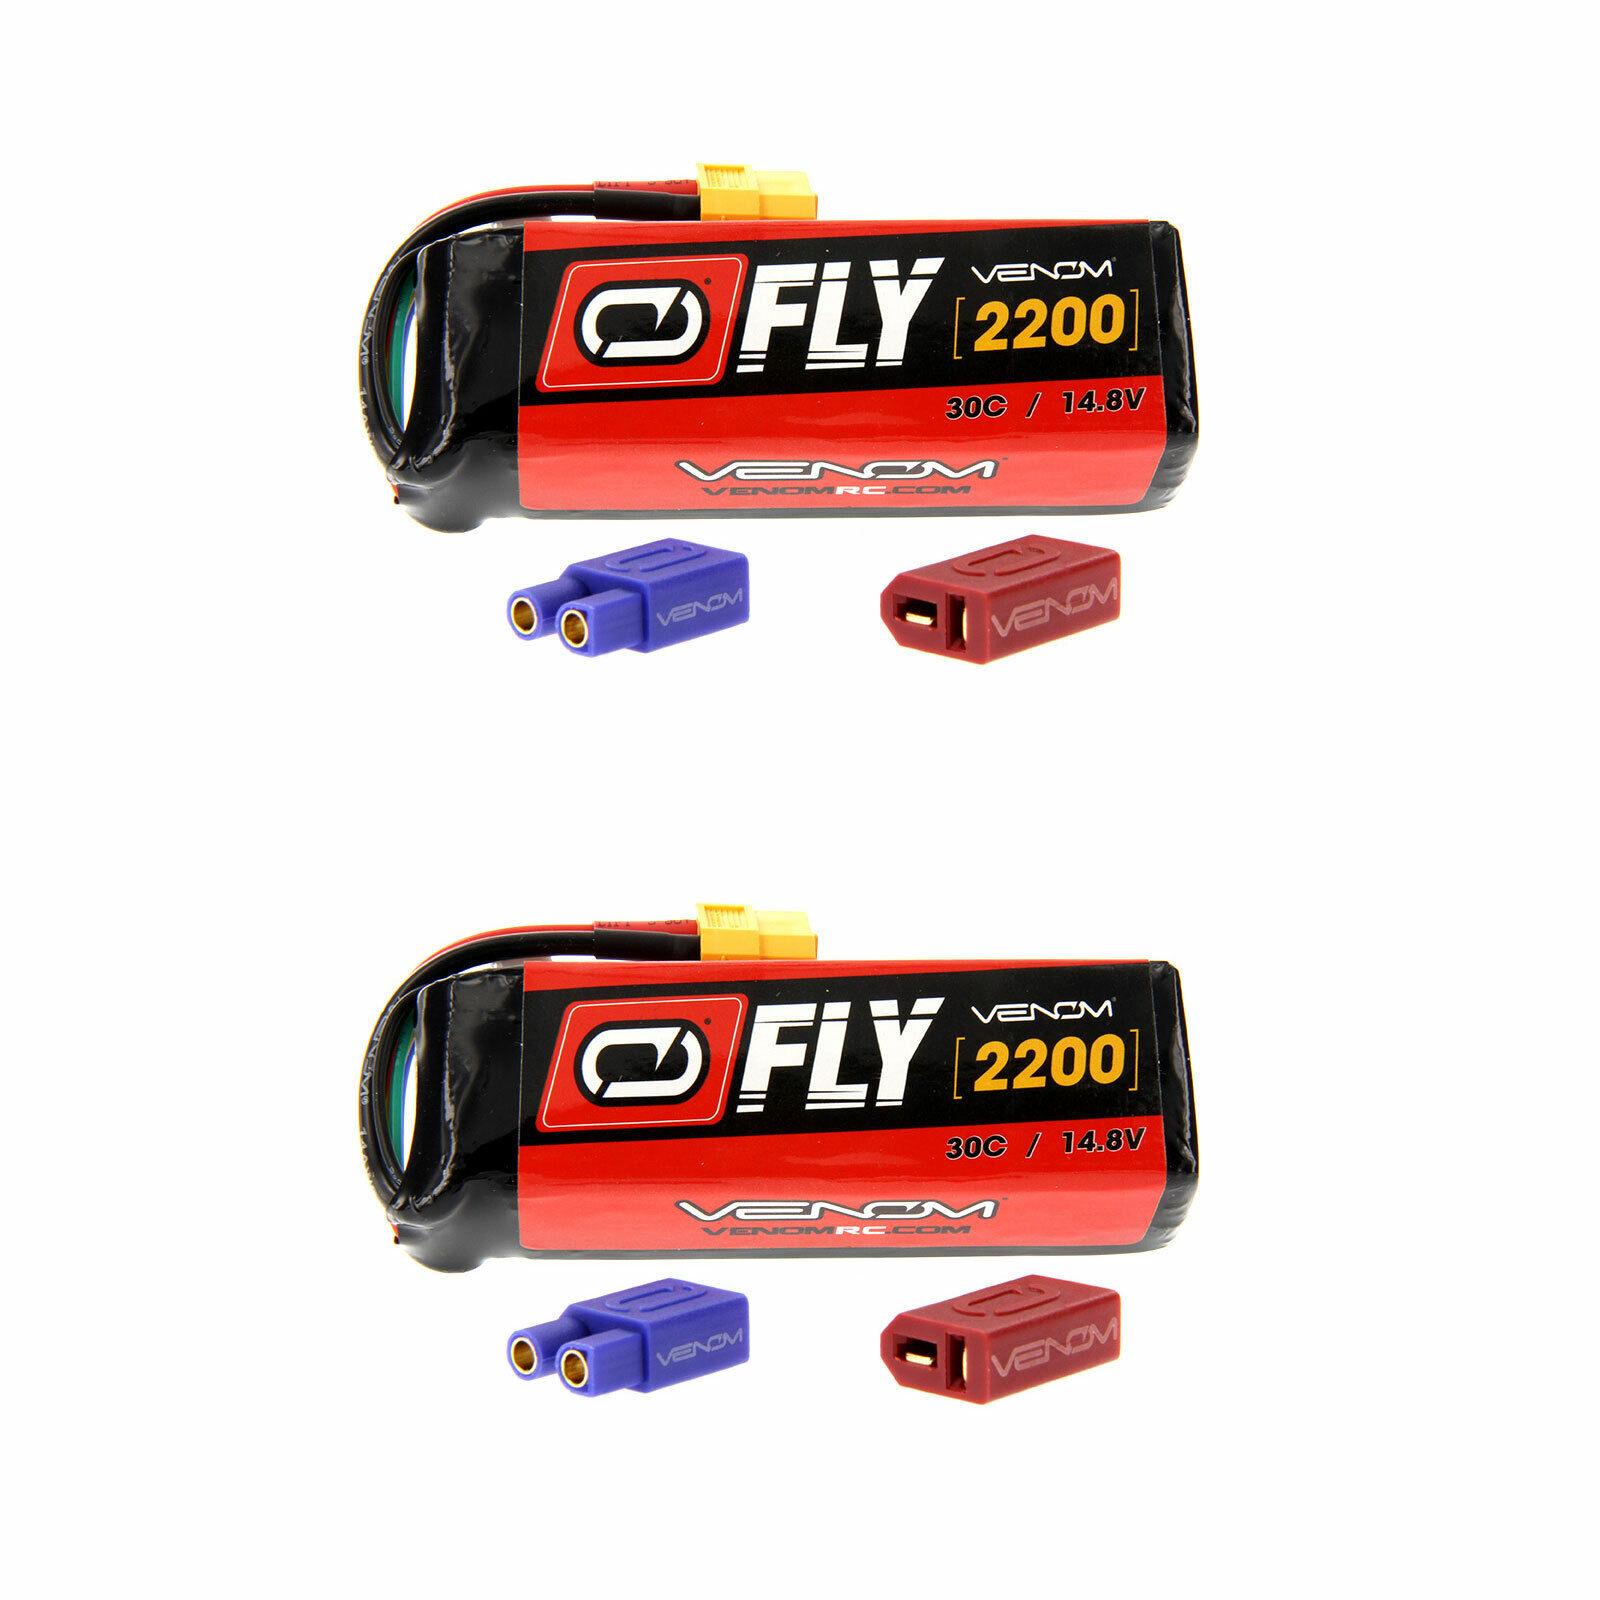 Venom volar 30C 4S 2200mAh 14.8V Batería Lipo Con Enchufe x2 Uni 2.0 paquetes